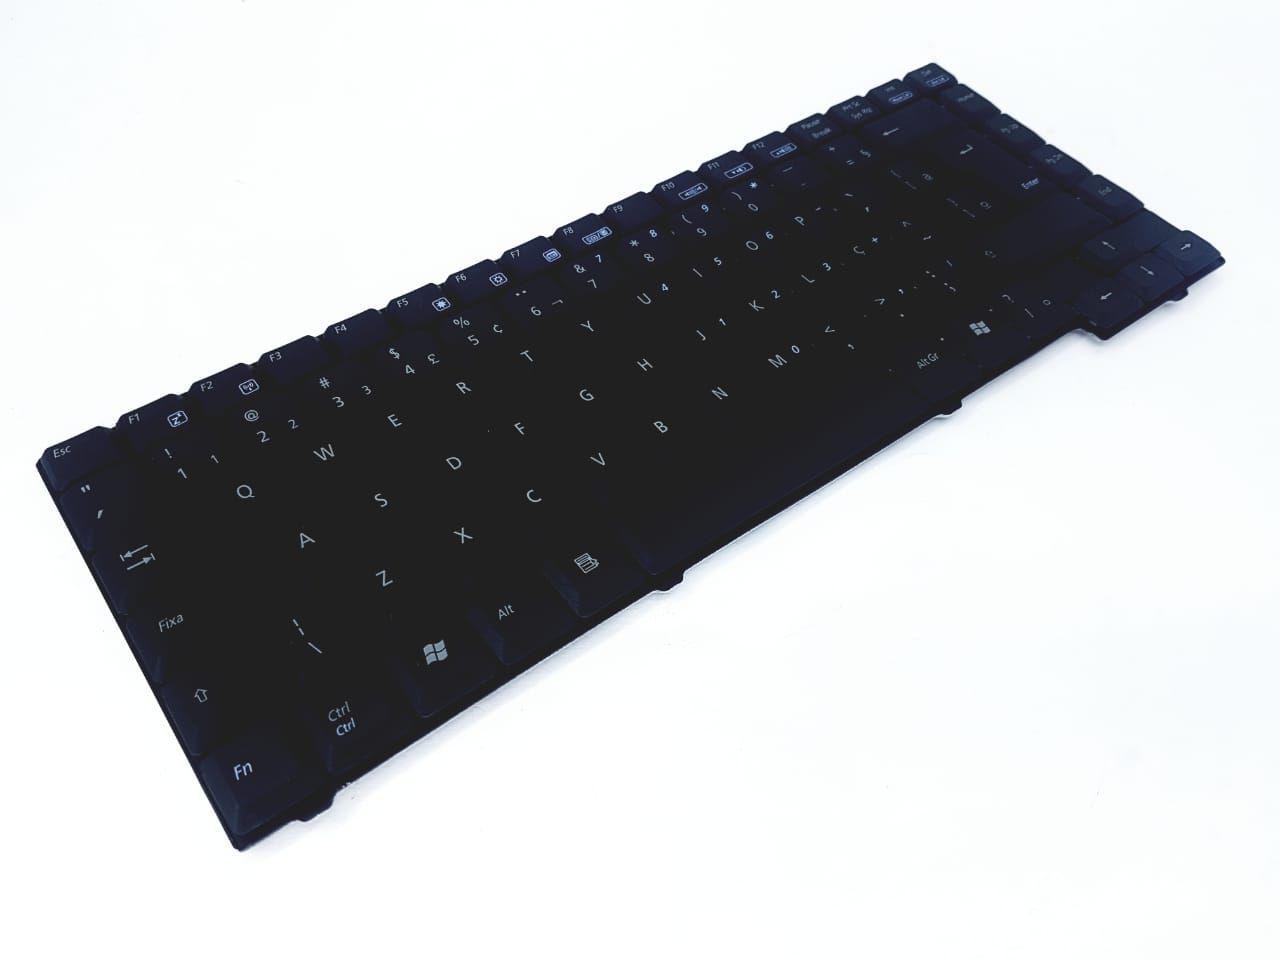 Teclado Asus A9t Z94 X50 X51 Philco Phn15145 V011162ck1 Br Ç